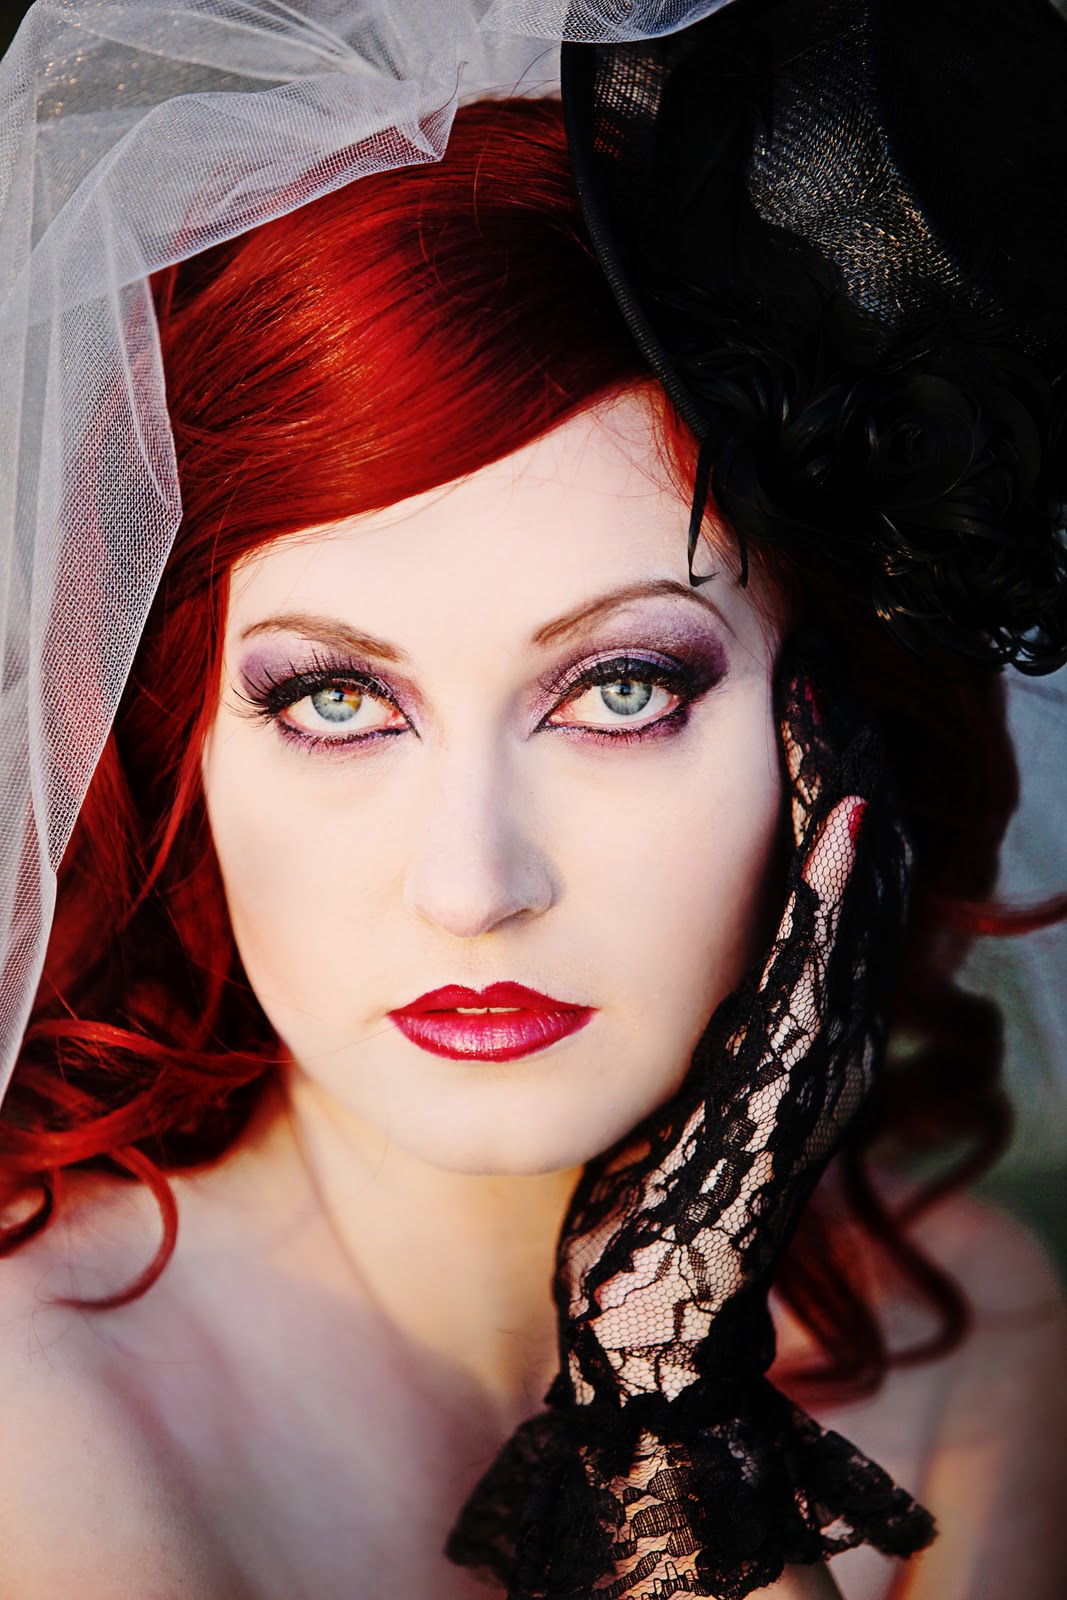 Gothic Wedding Makeup : Your Wedding Idea : Gothic Wedding MakeUp - For Bride